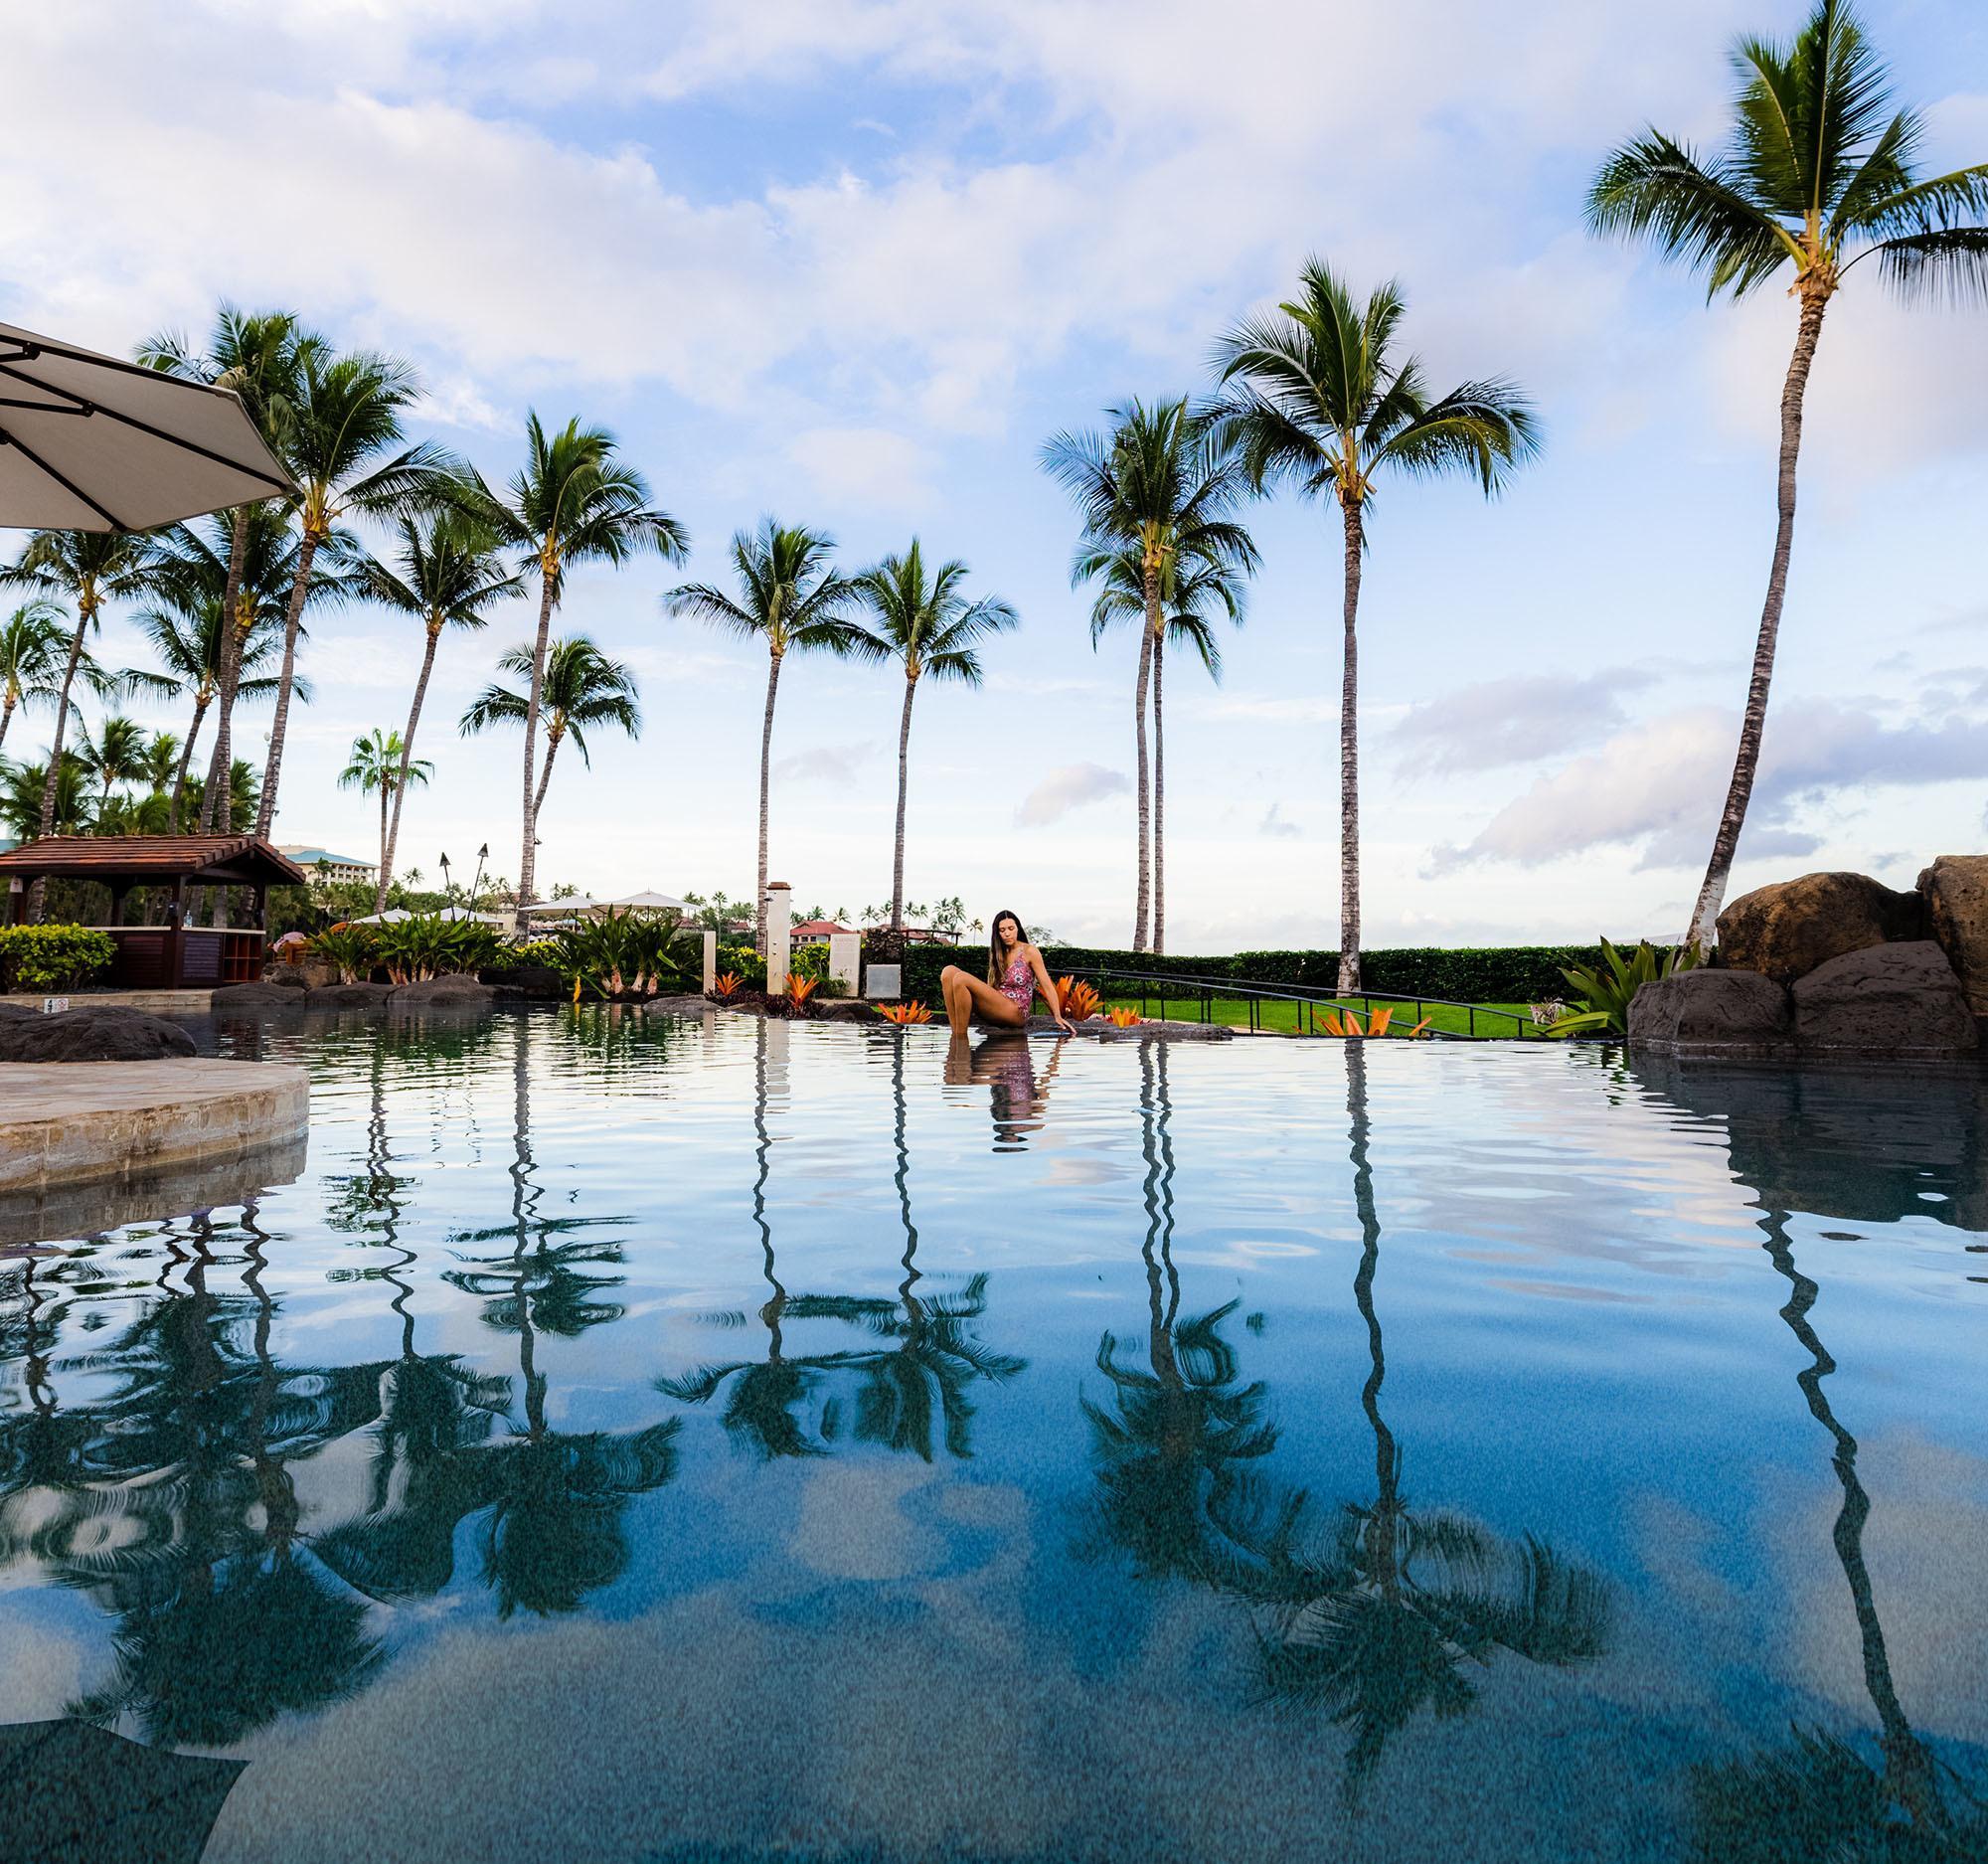 The infinity pool at Wailea Beach Villas in Maui, Hawaii